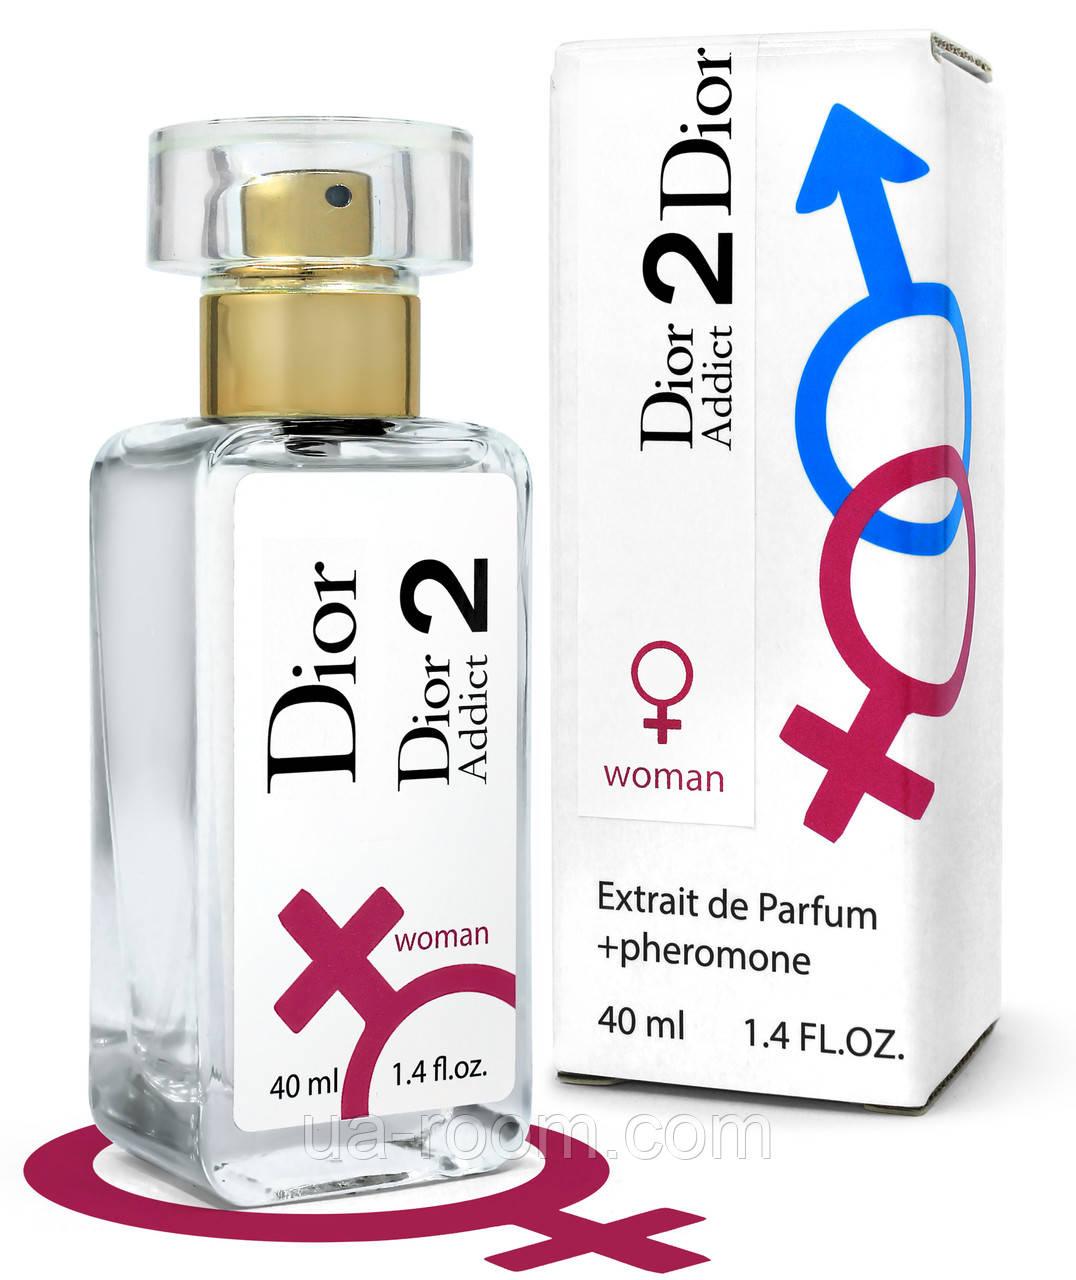 Тестер Pheromone женский Christian Dior Addict 2, 40 мл.